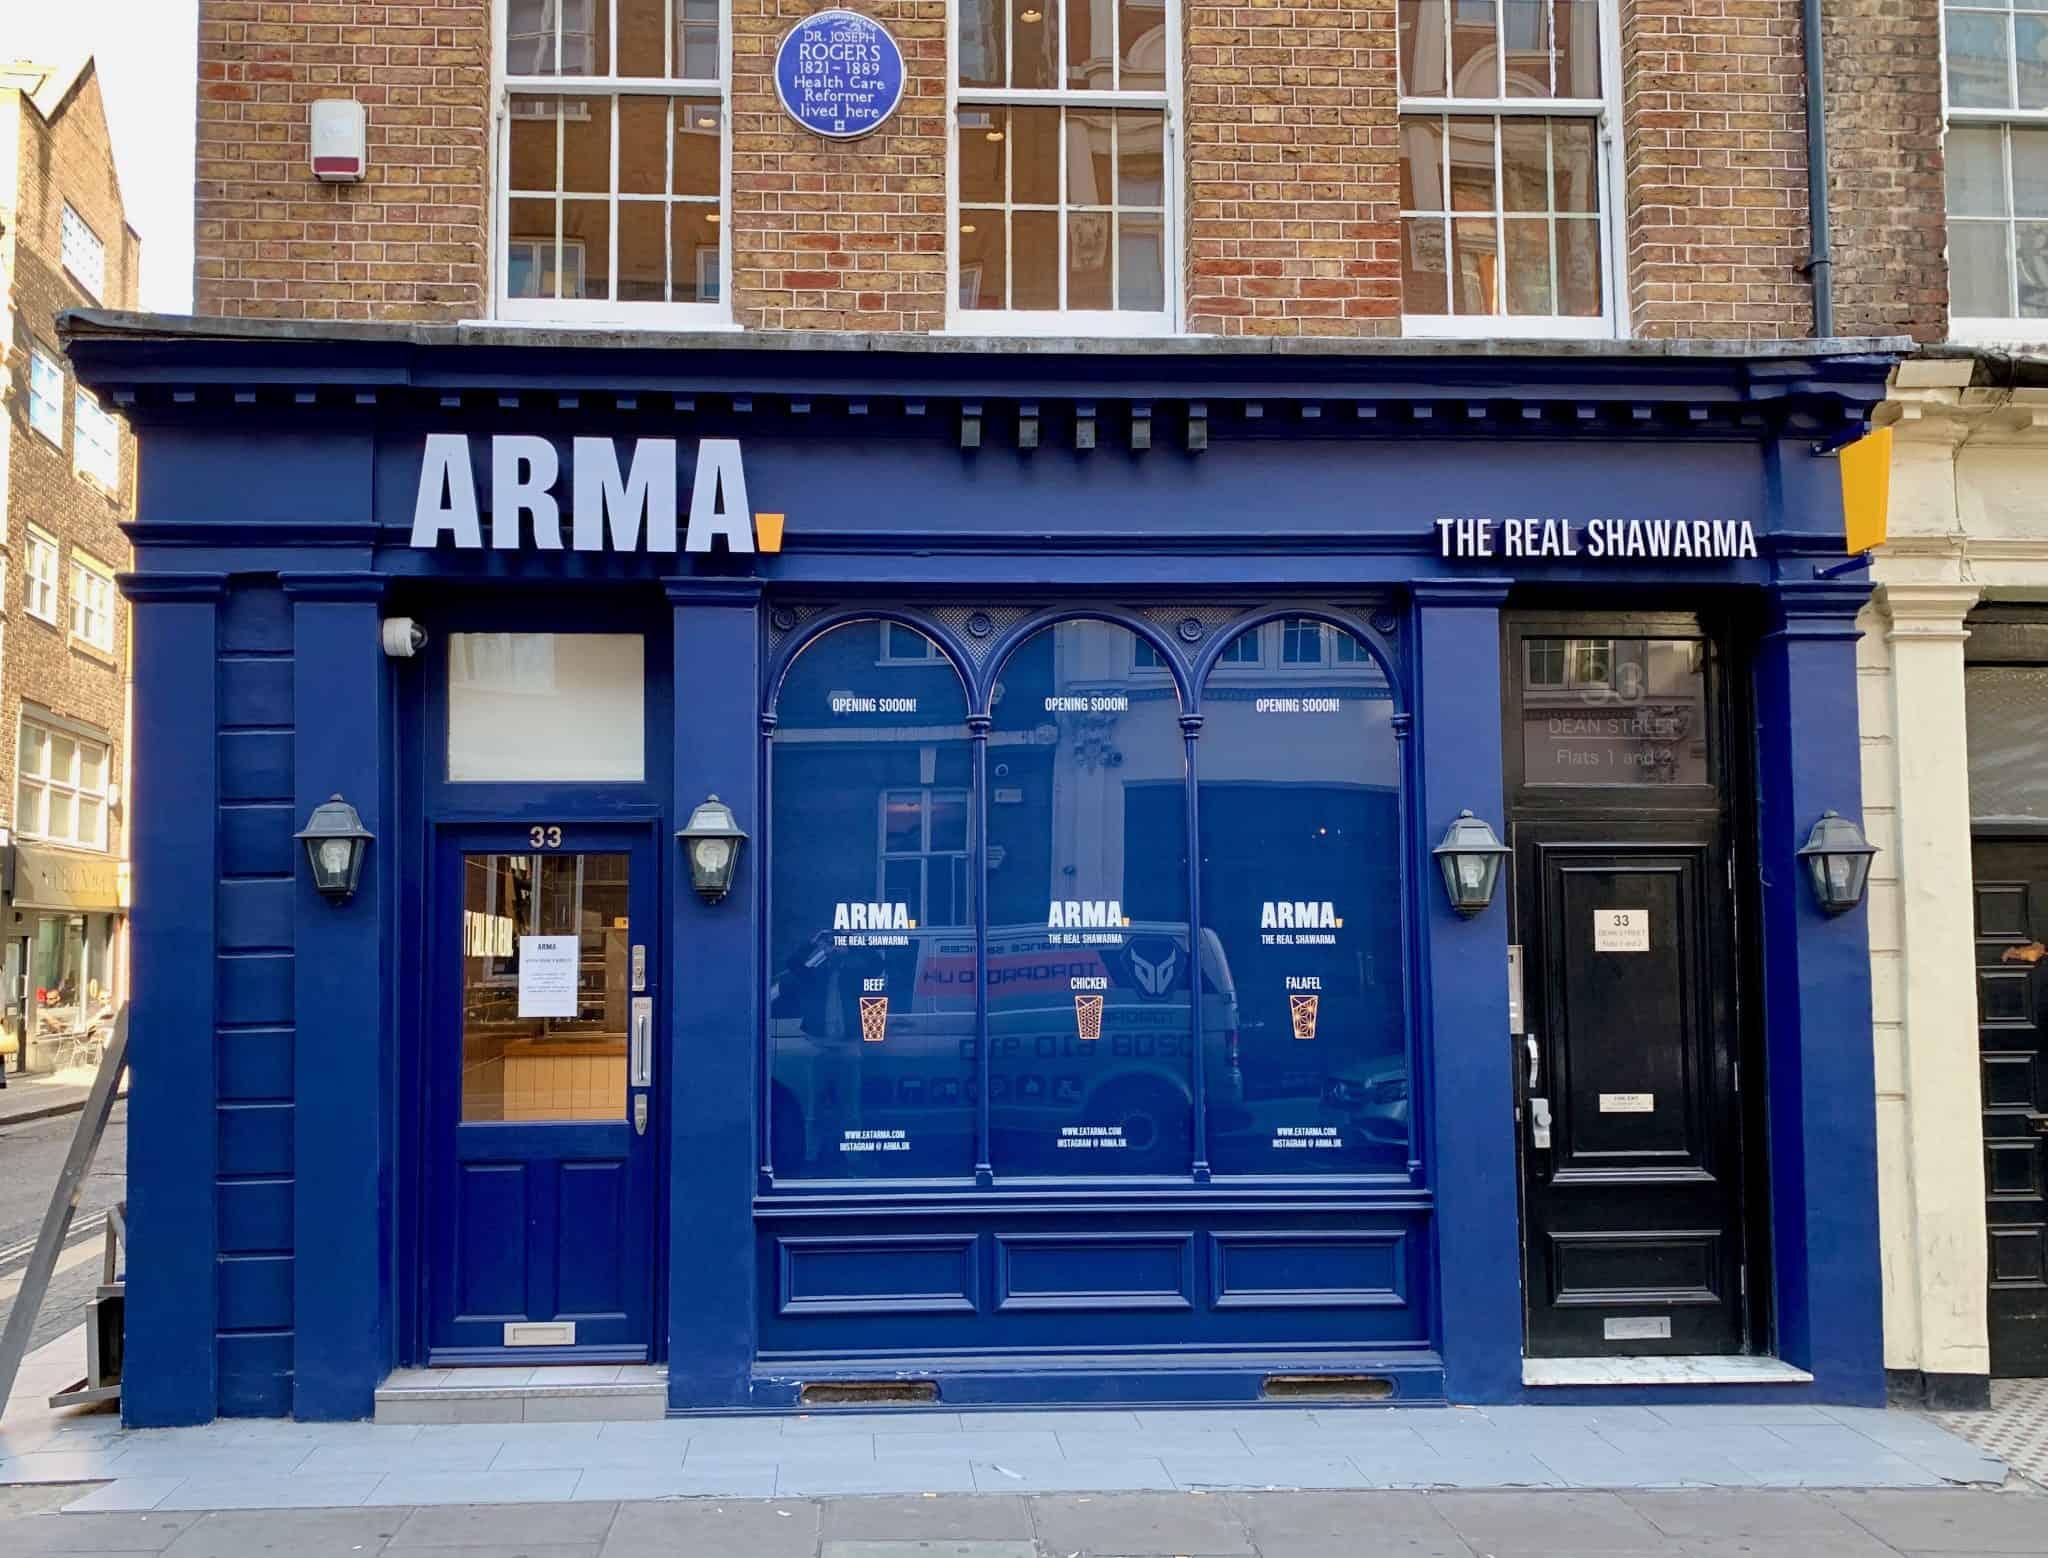 ARMA – Exterior new restaurant